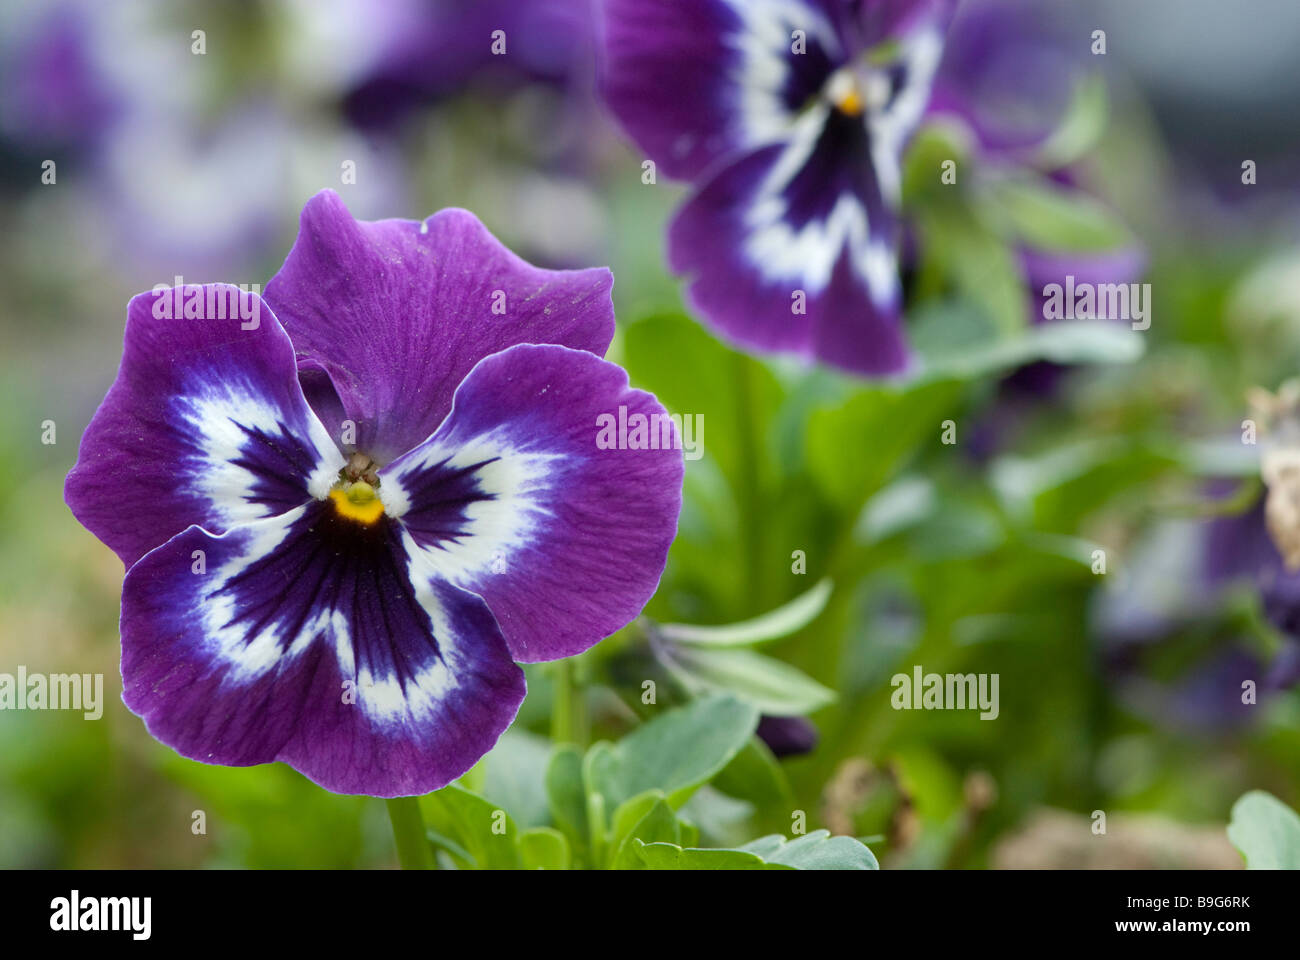 A purple Pansy - Stock Image